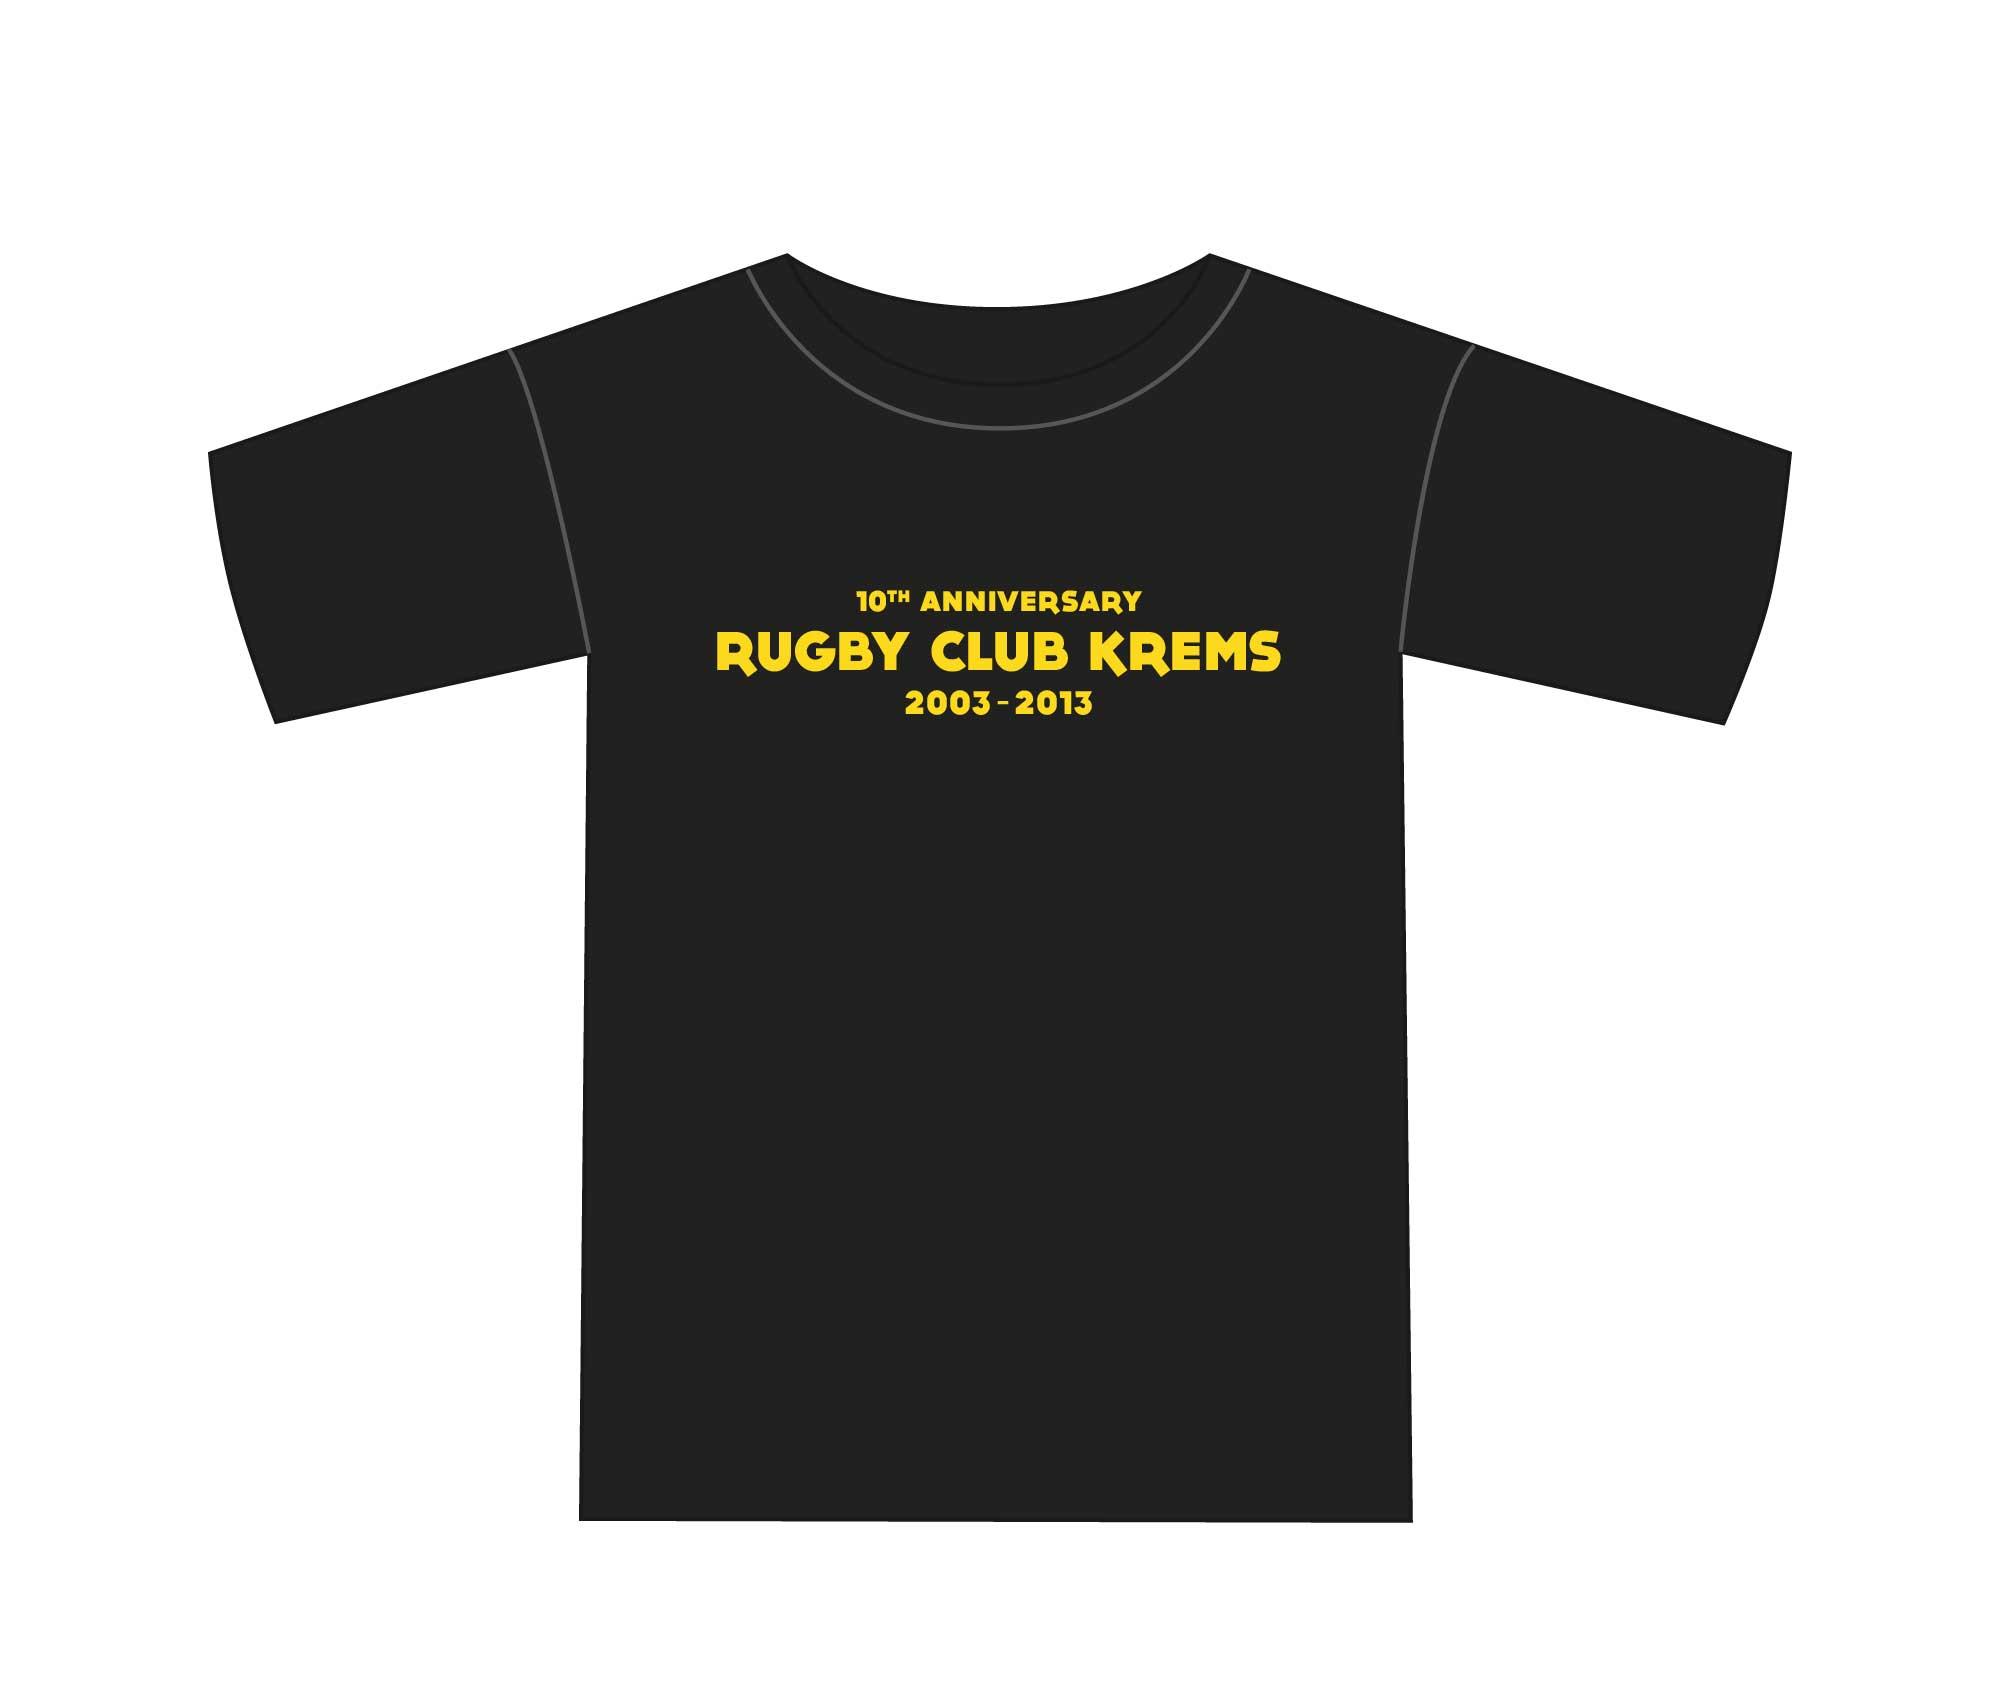 10-Jahre Rugby Club Krems Shirt